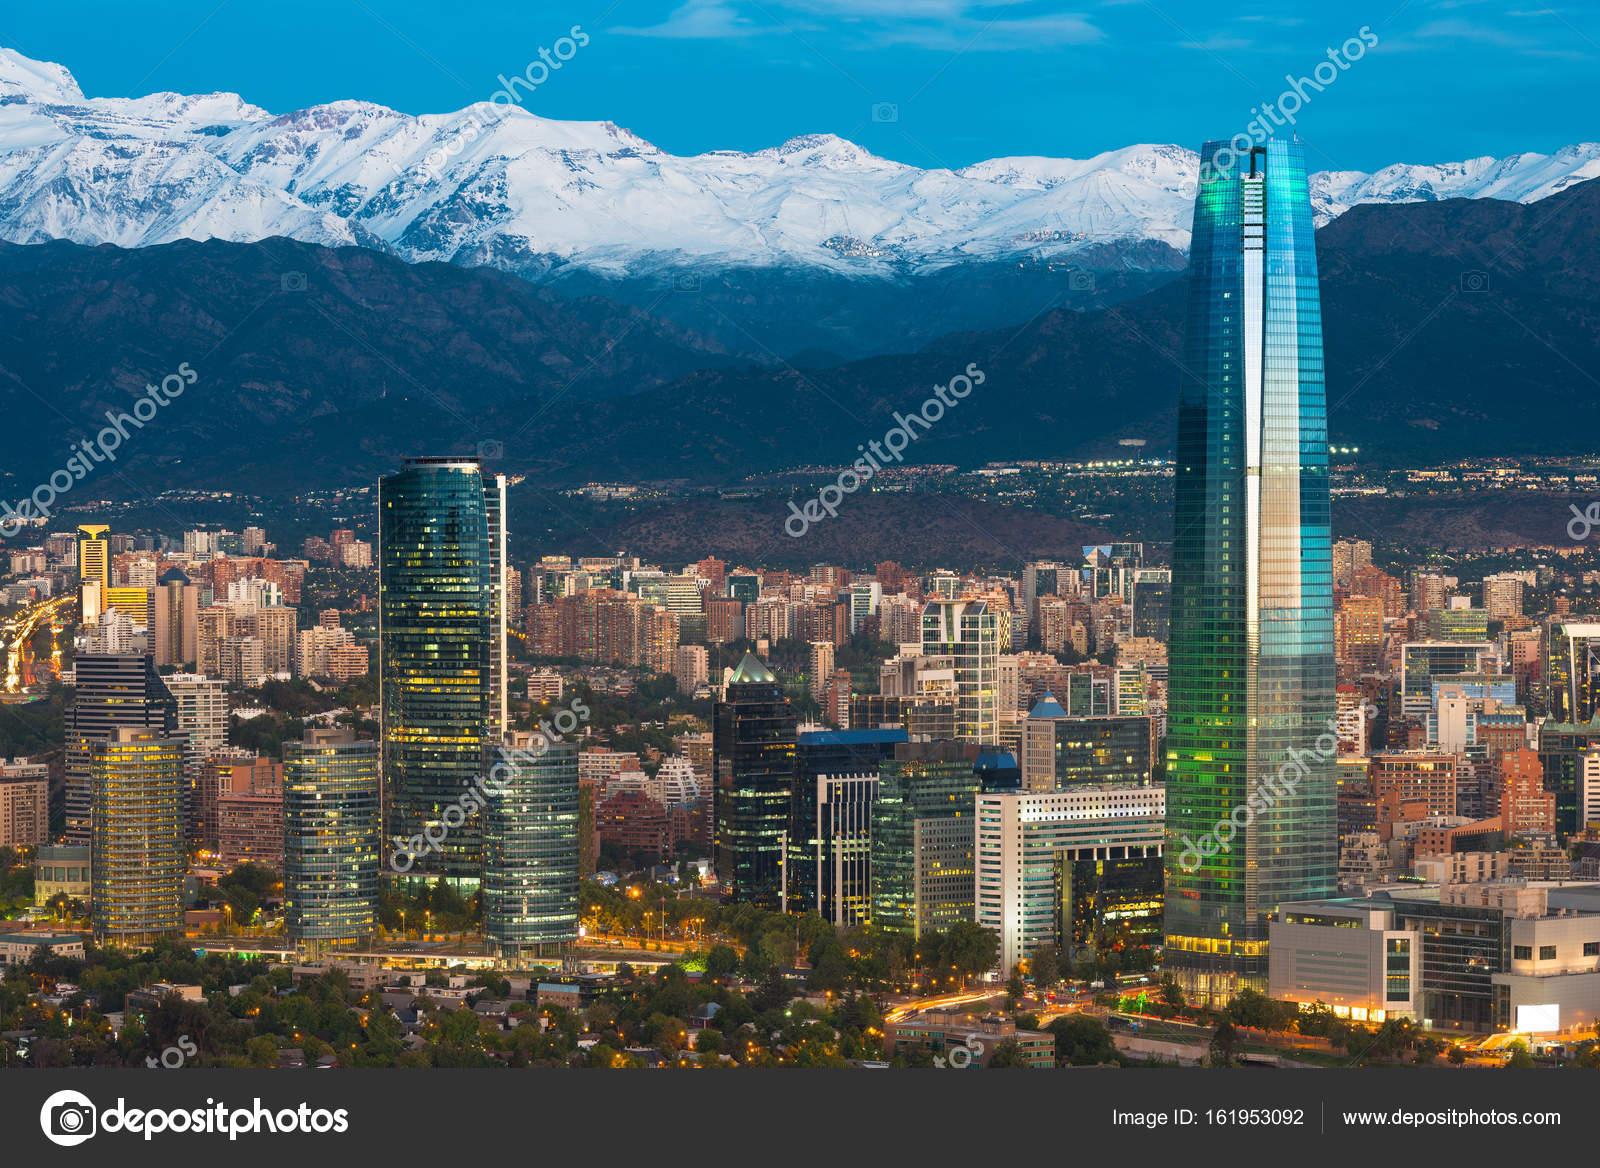 Skyline Von Santiago De Chile Stockfoto Tifonimages 161953092